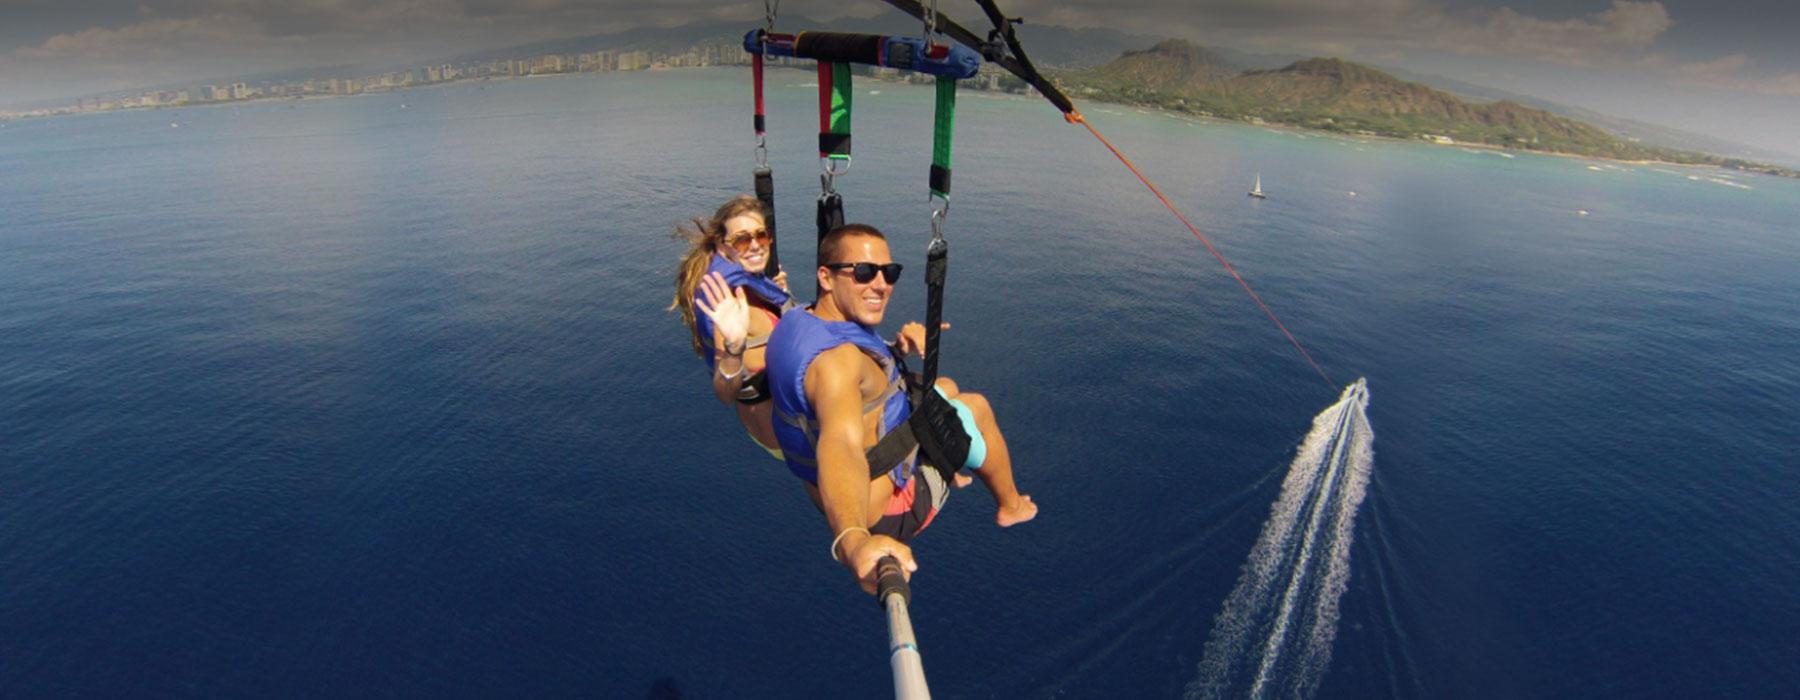 Soar above Honolulu's coastline!